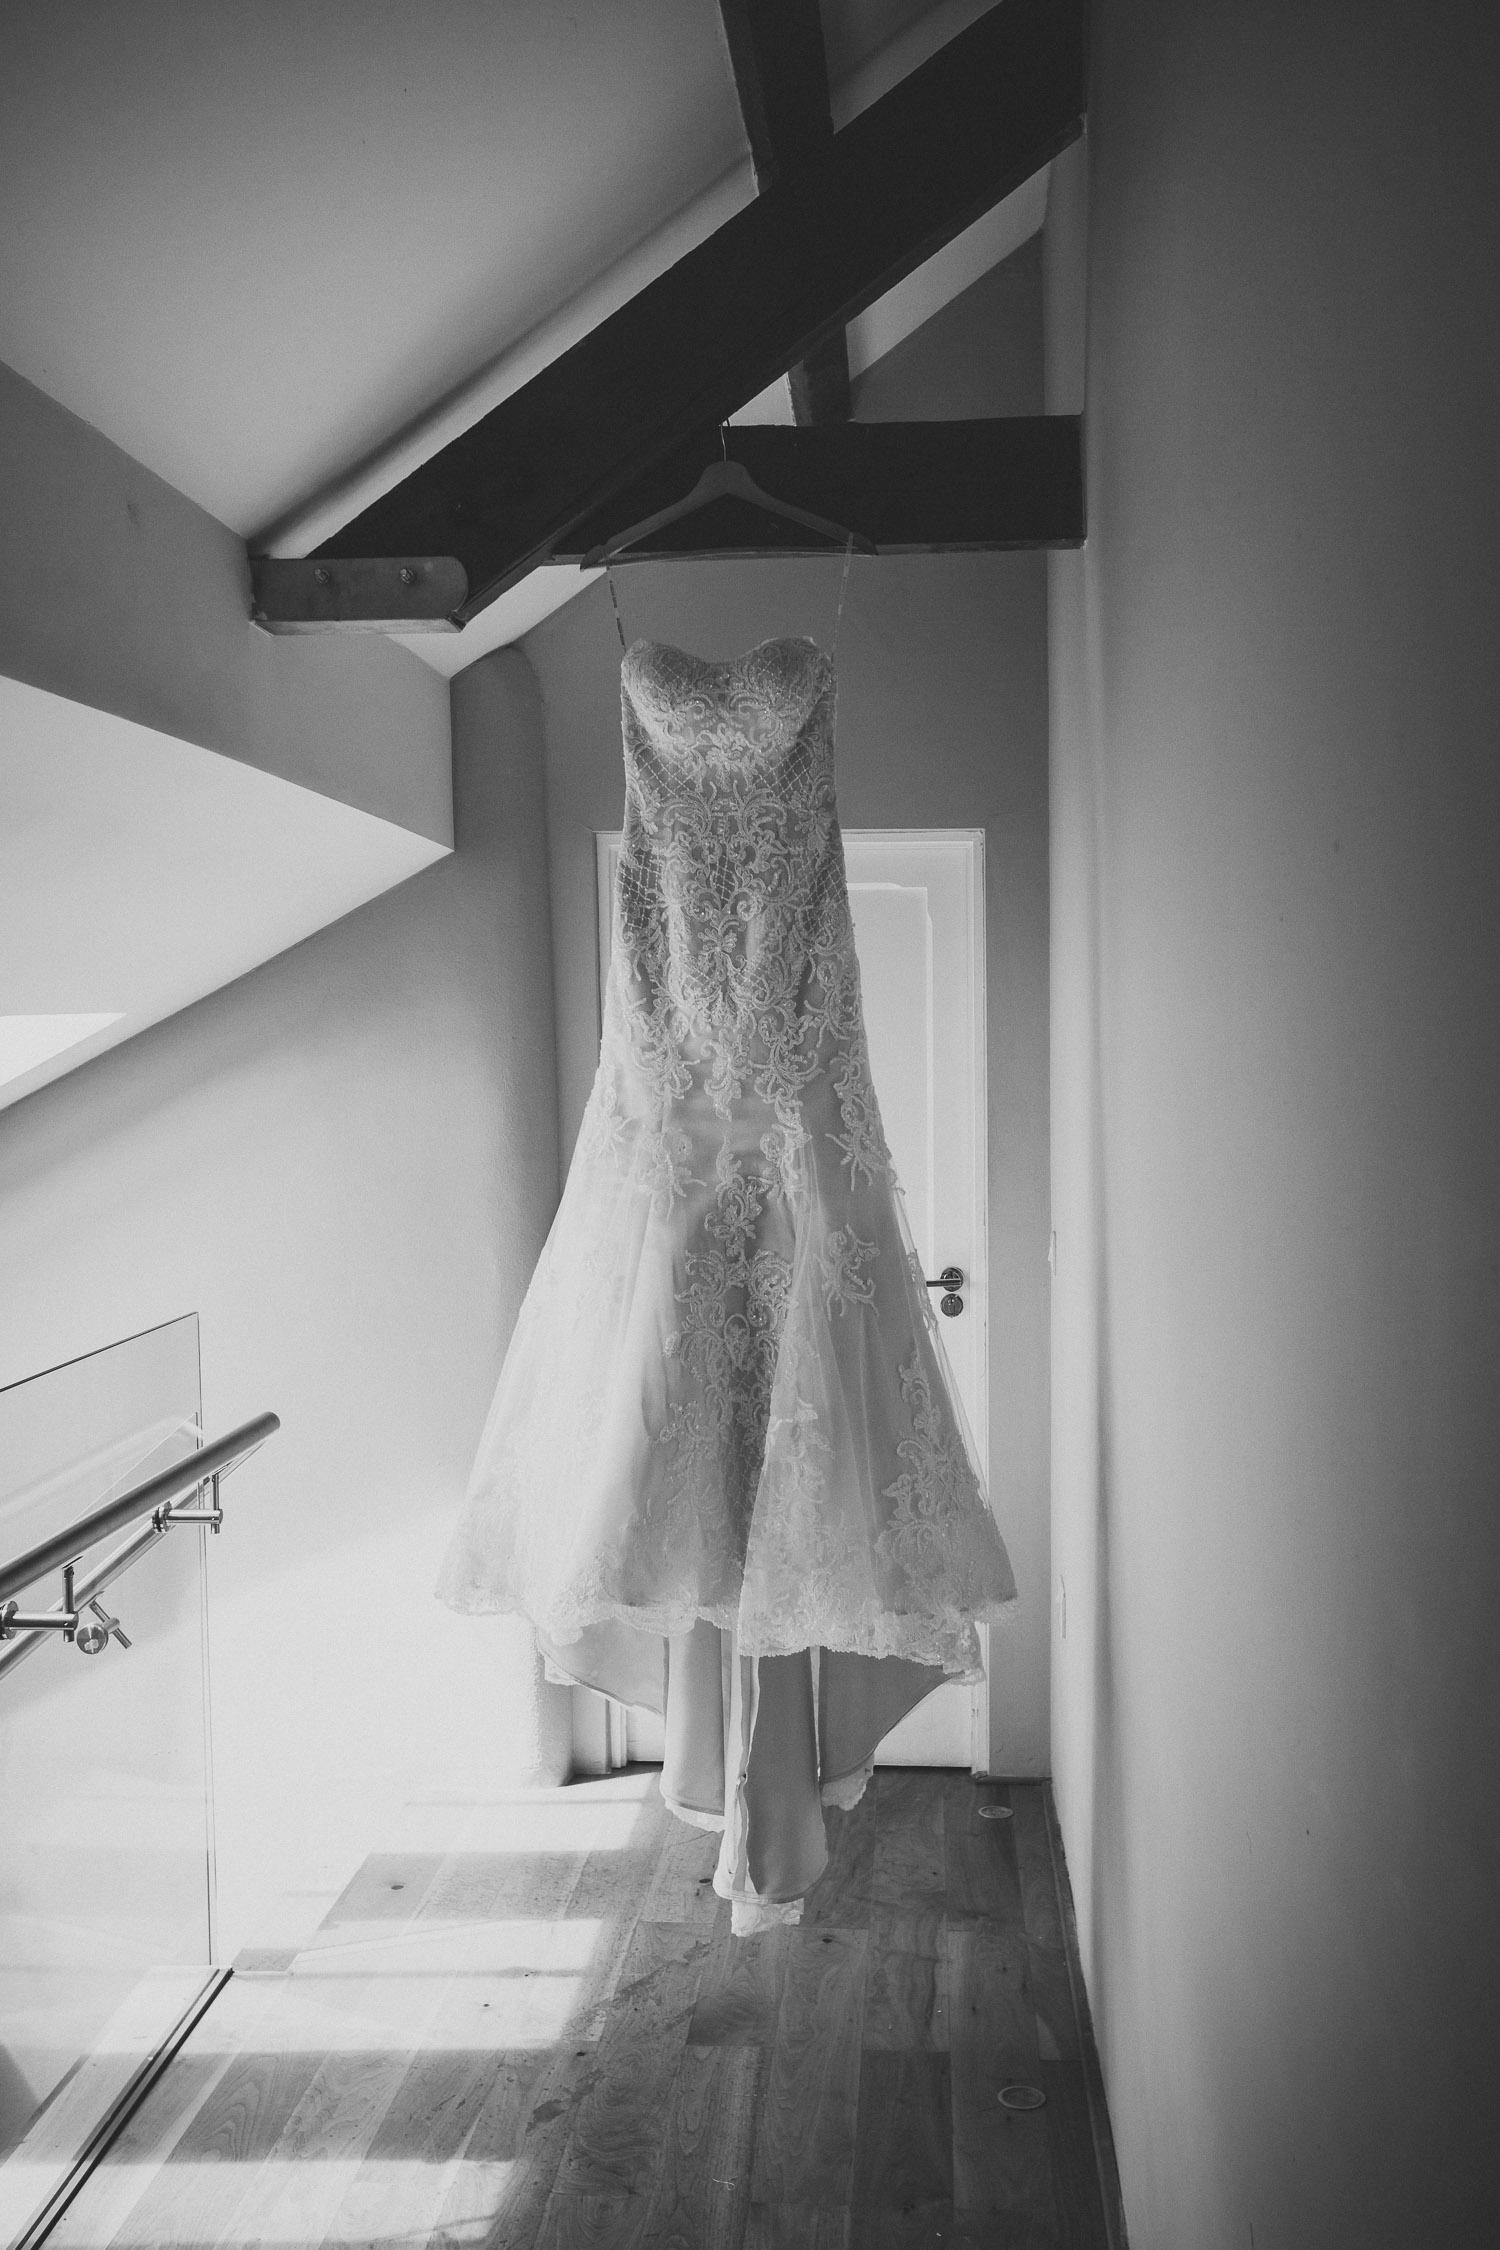 TS_wedding_trevenna_cornwall-10.jpg